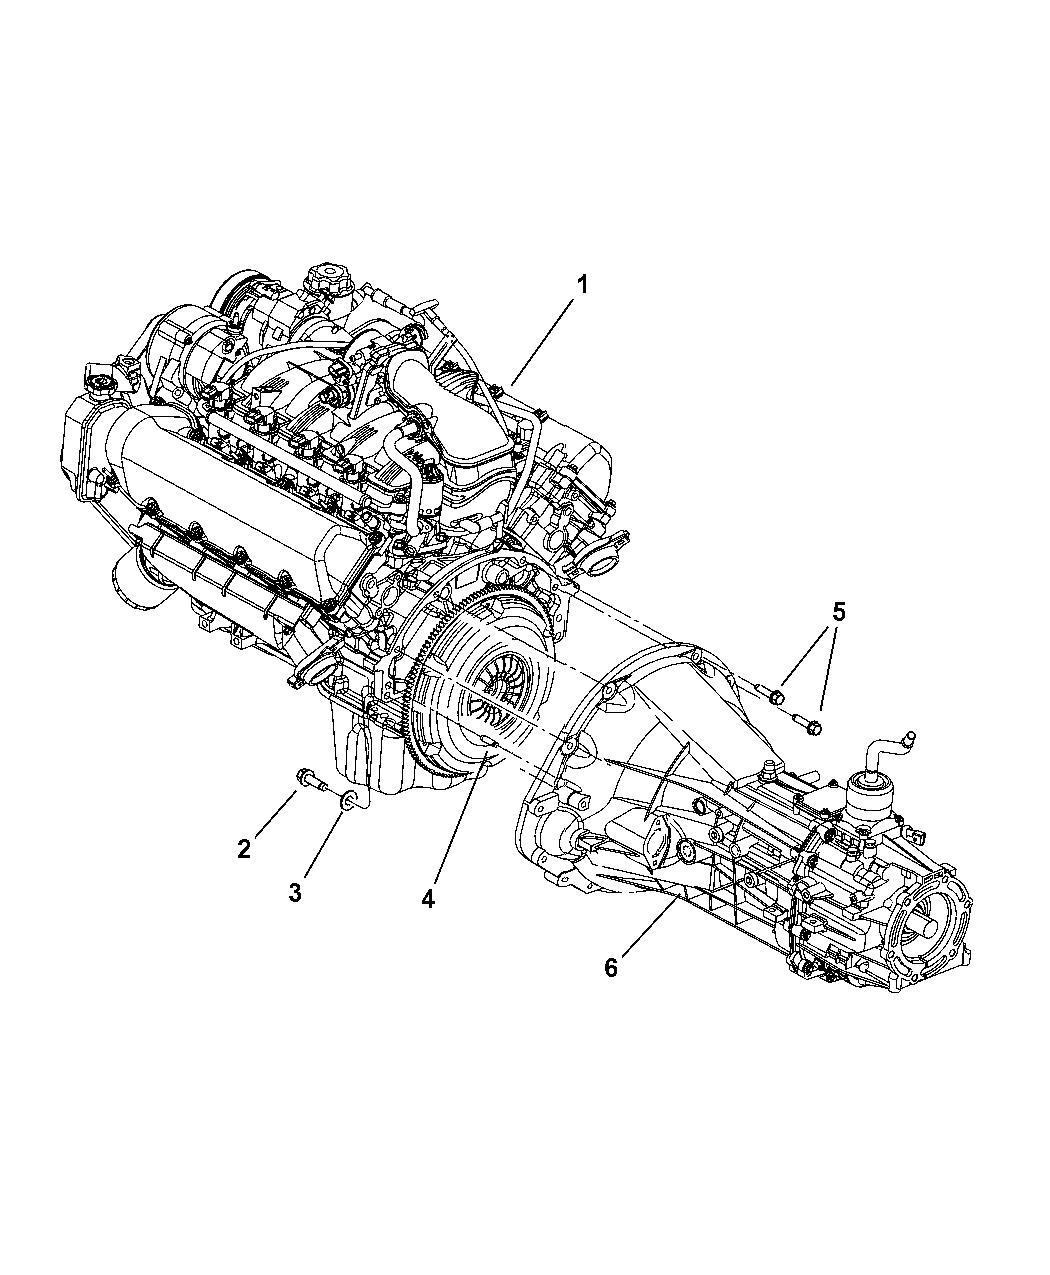 2005 dodge dakota transmission mounting of manual transmission.